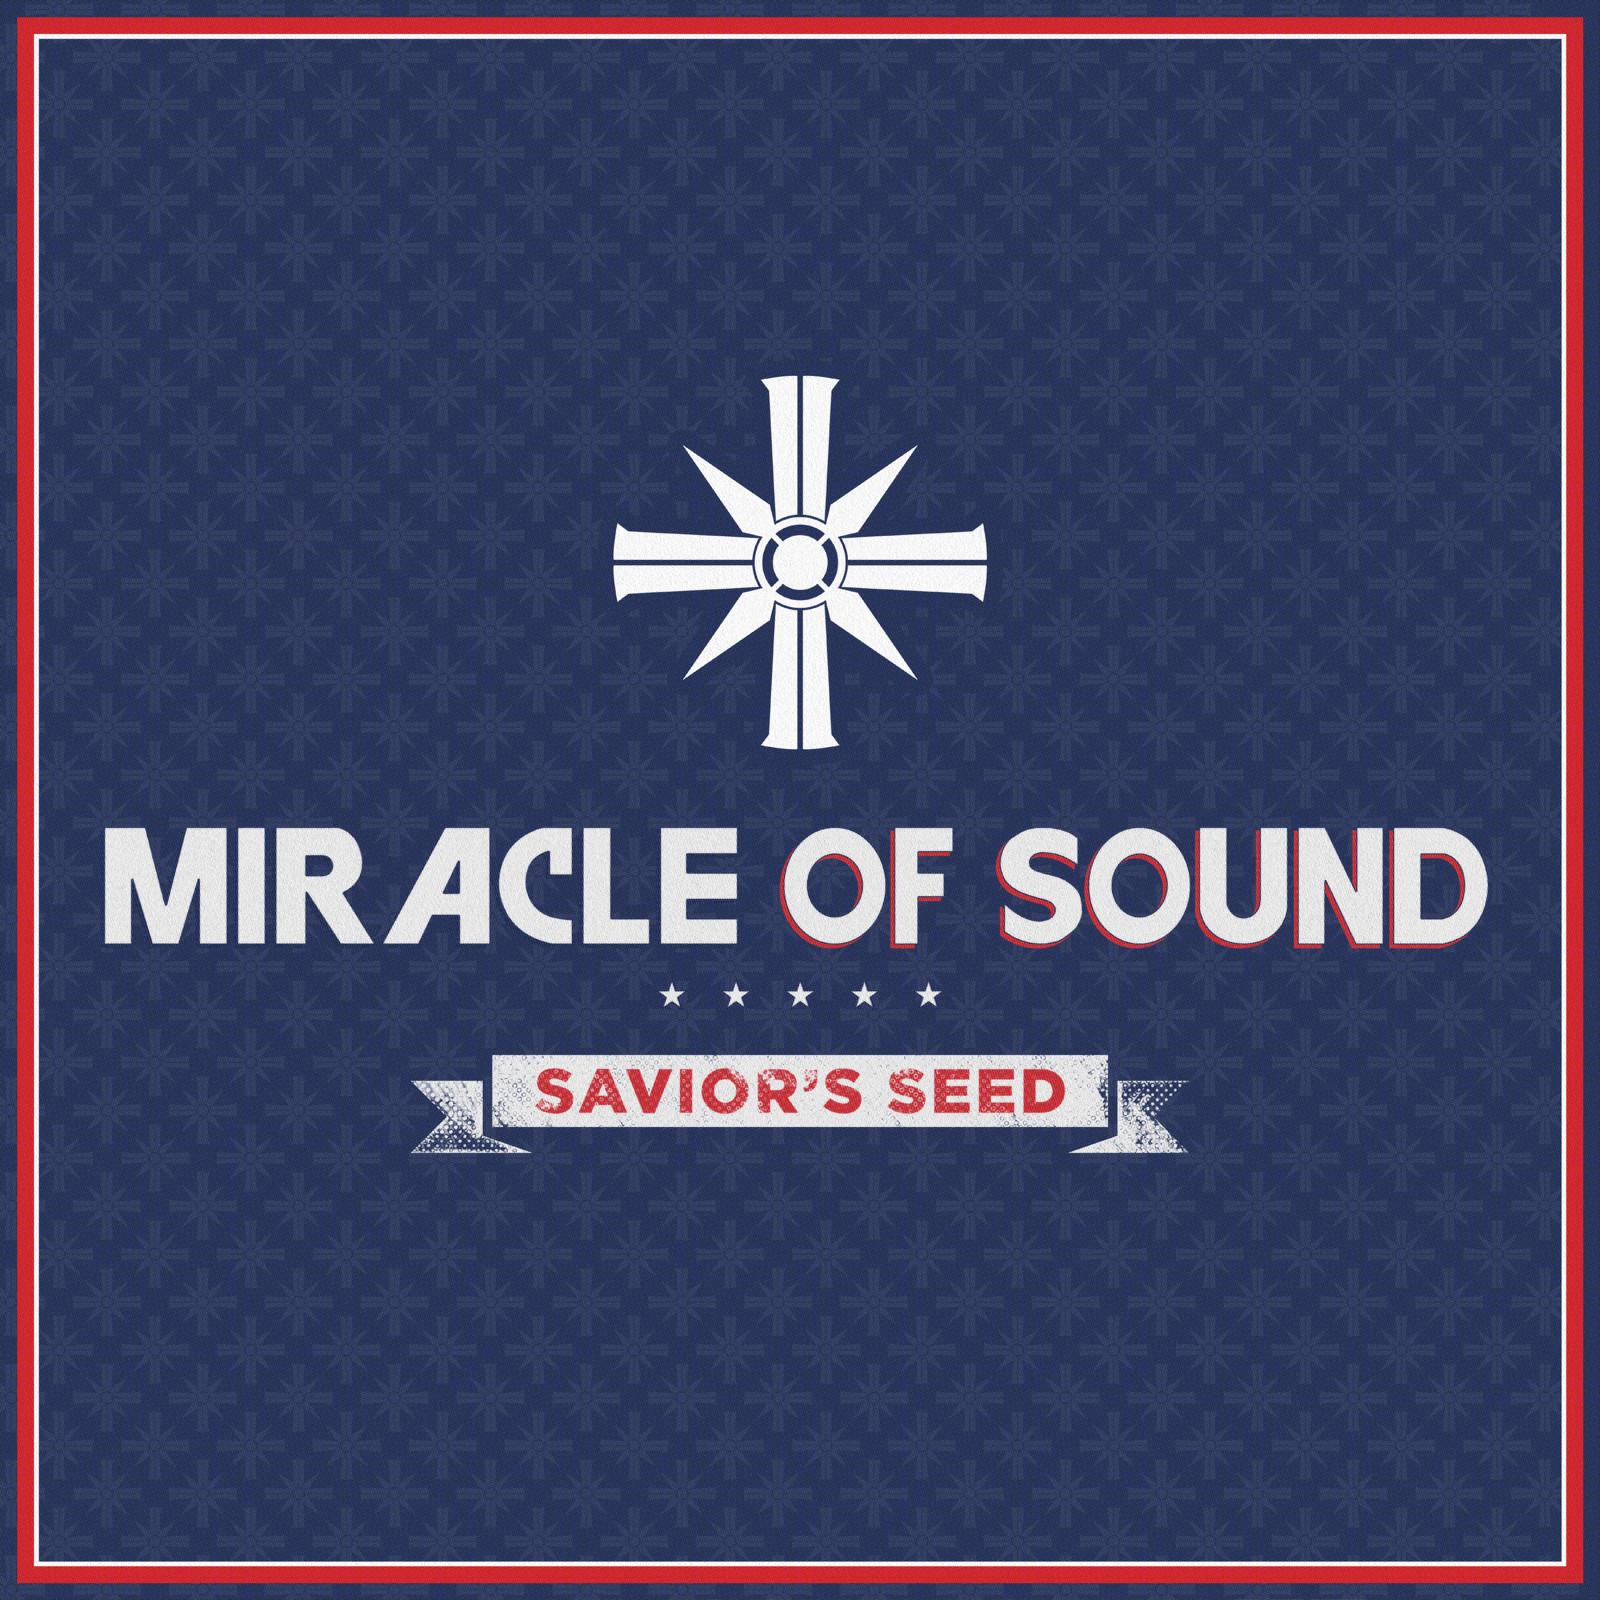 Alfred khamidullin saviors seed15